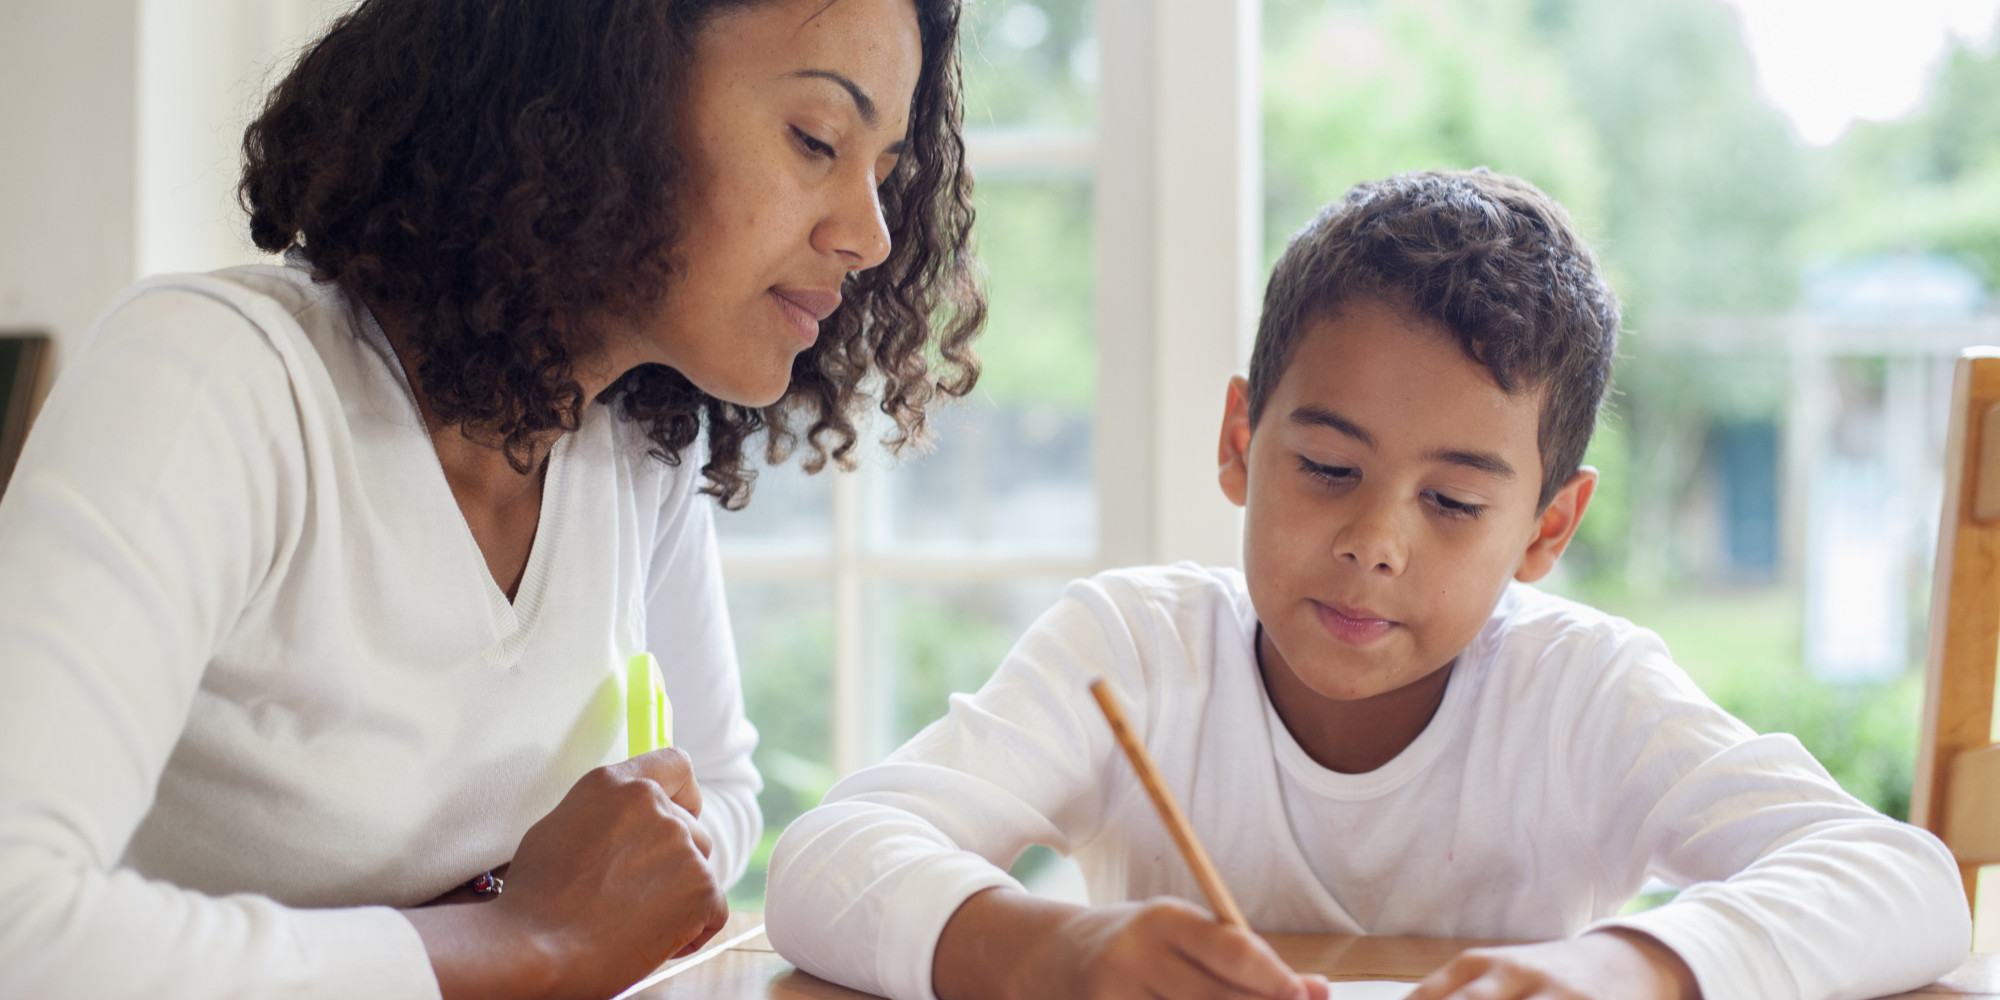 homework parents responsibility children hard parent easy prioritize empathy finds tips huffpost mehta roy via getty survey